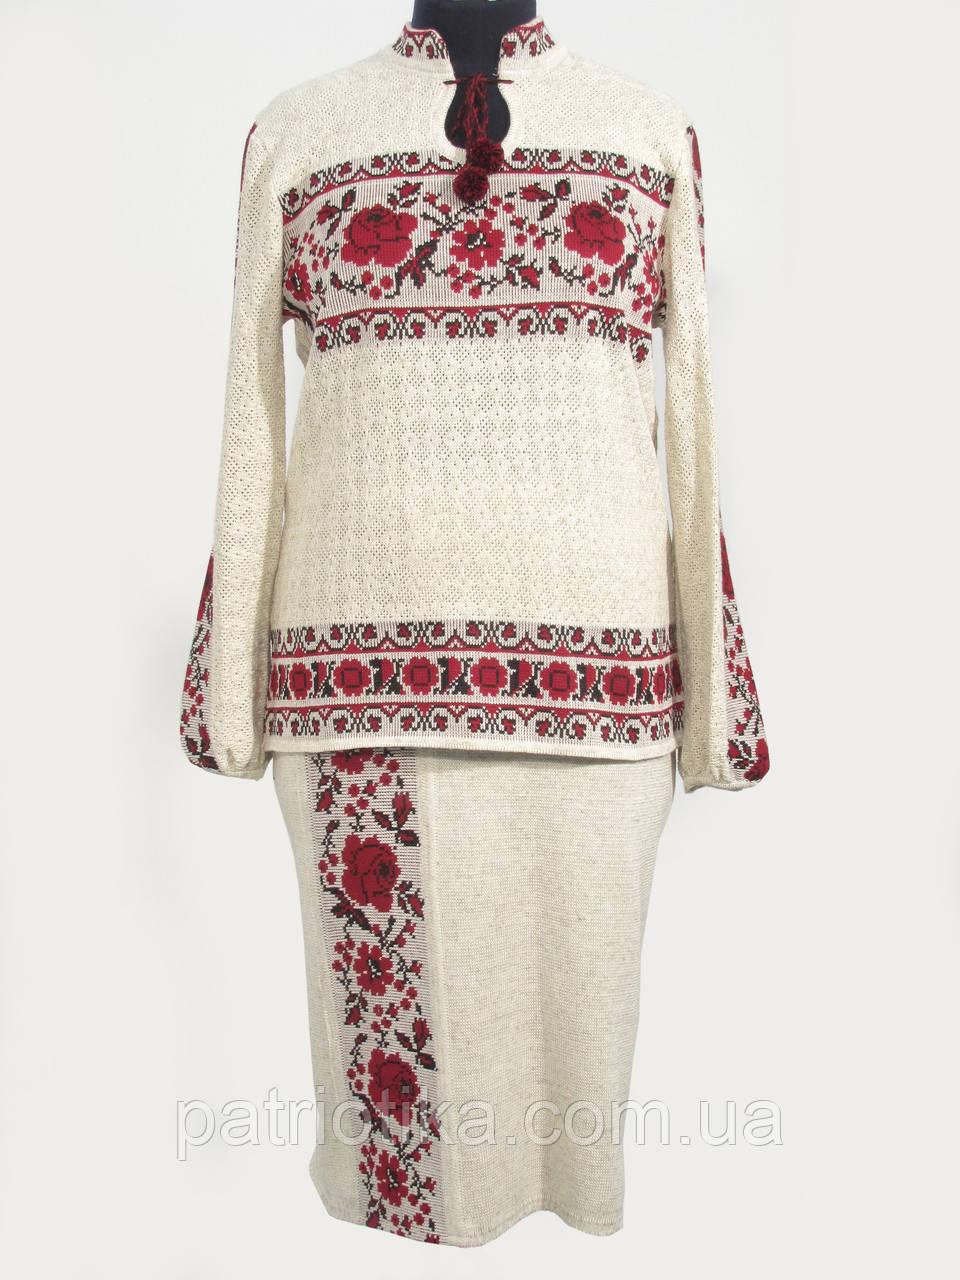 Женский вязаный костюм | Жіночий в'язаний костюм